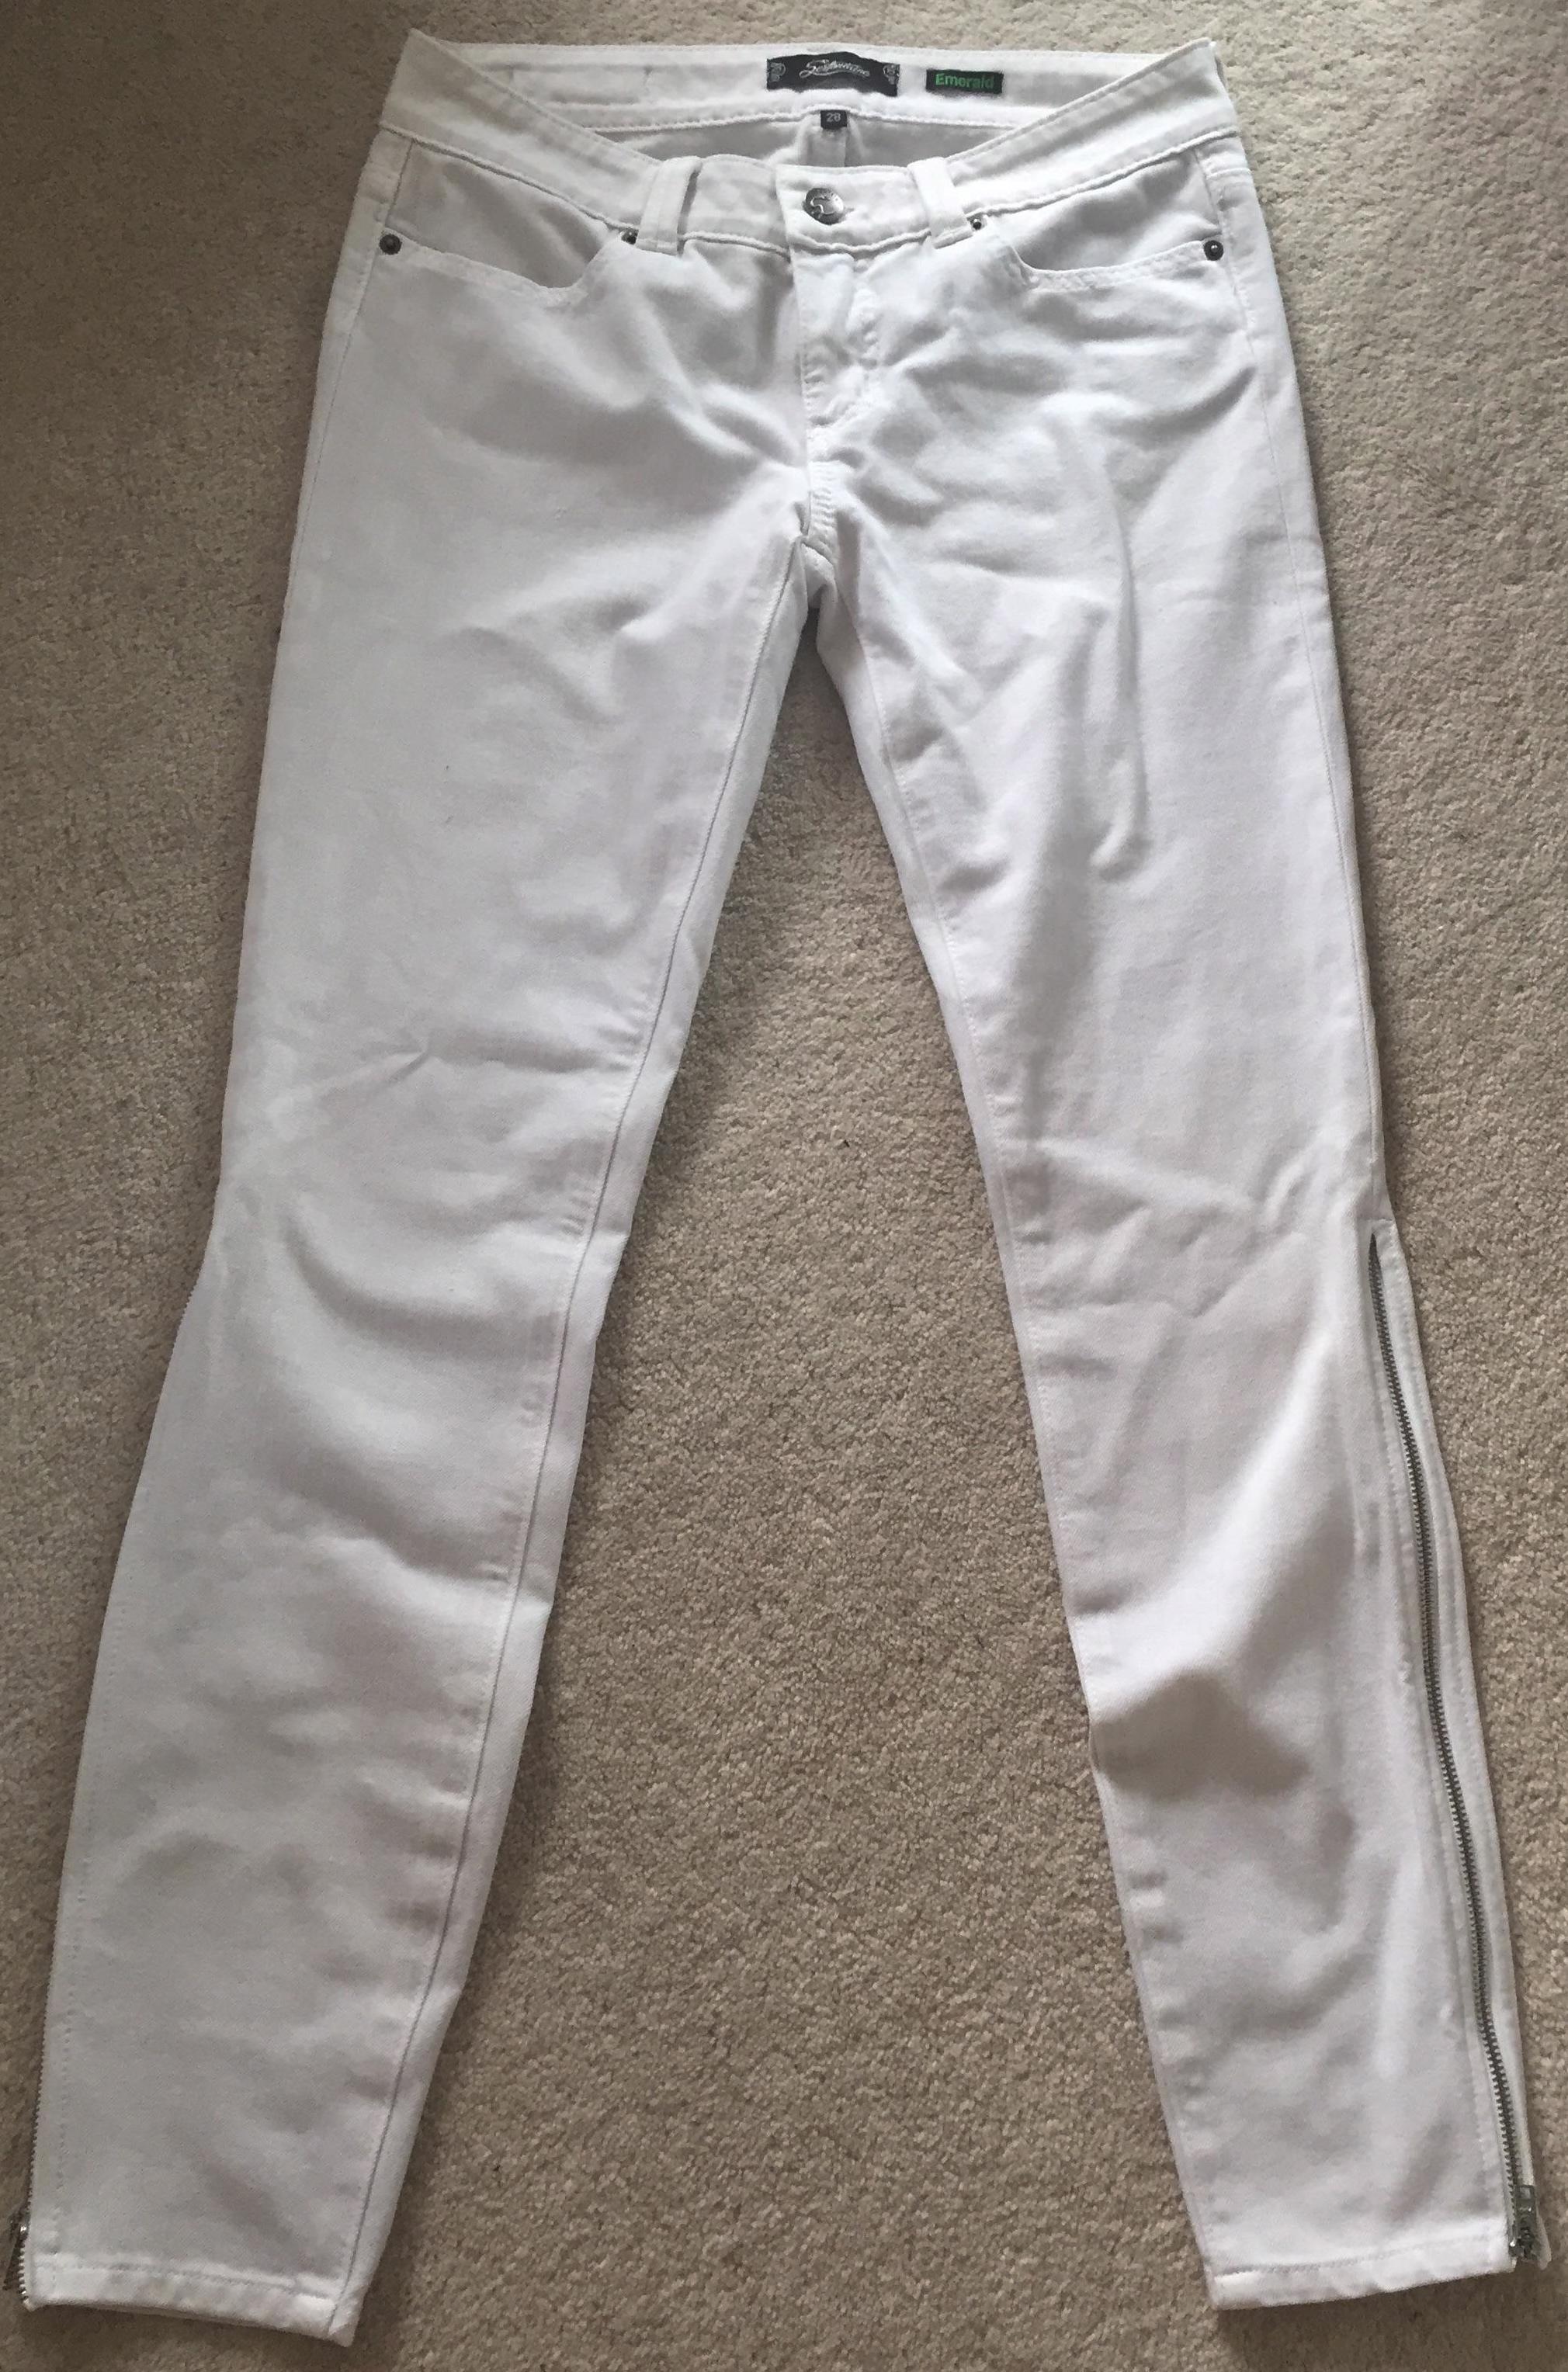 Serafontaine Emerald White Jeans